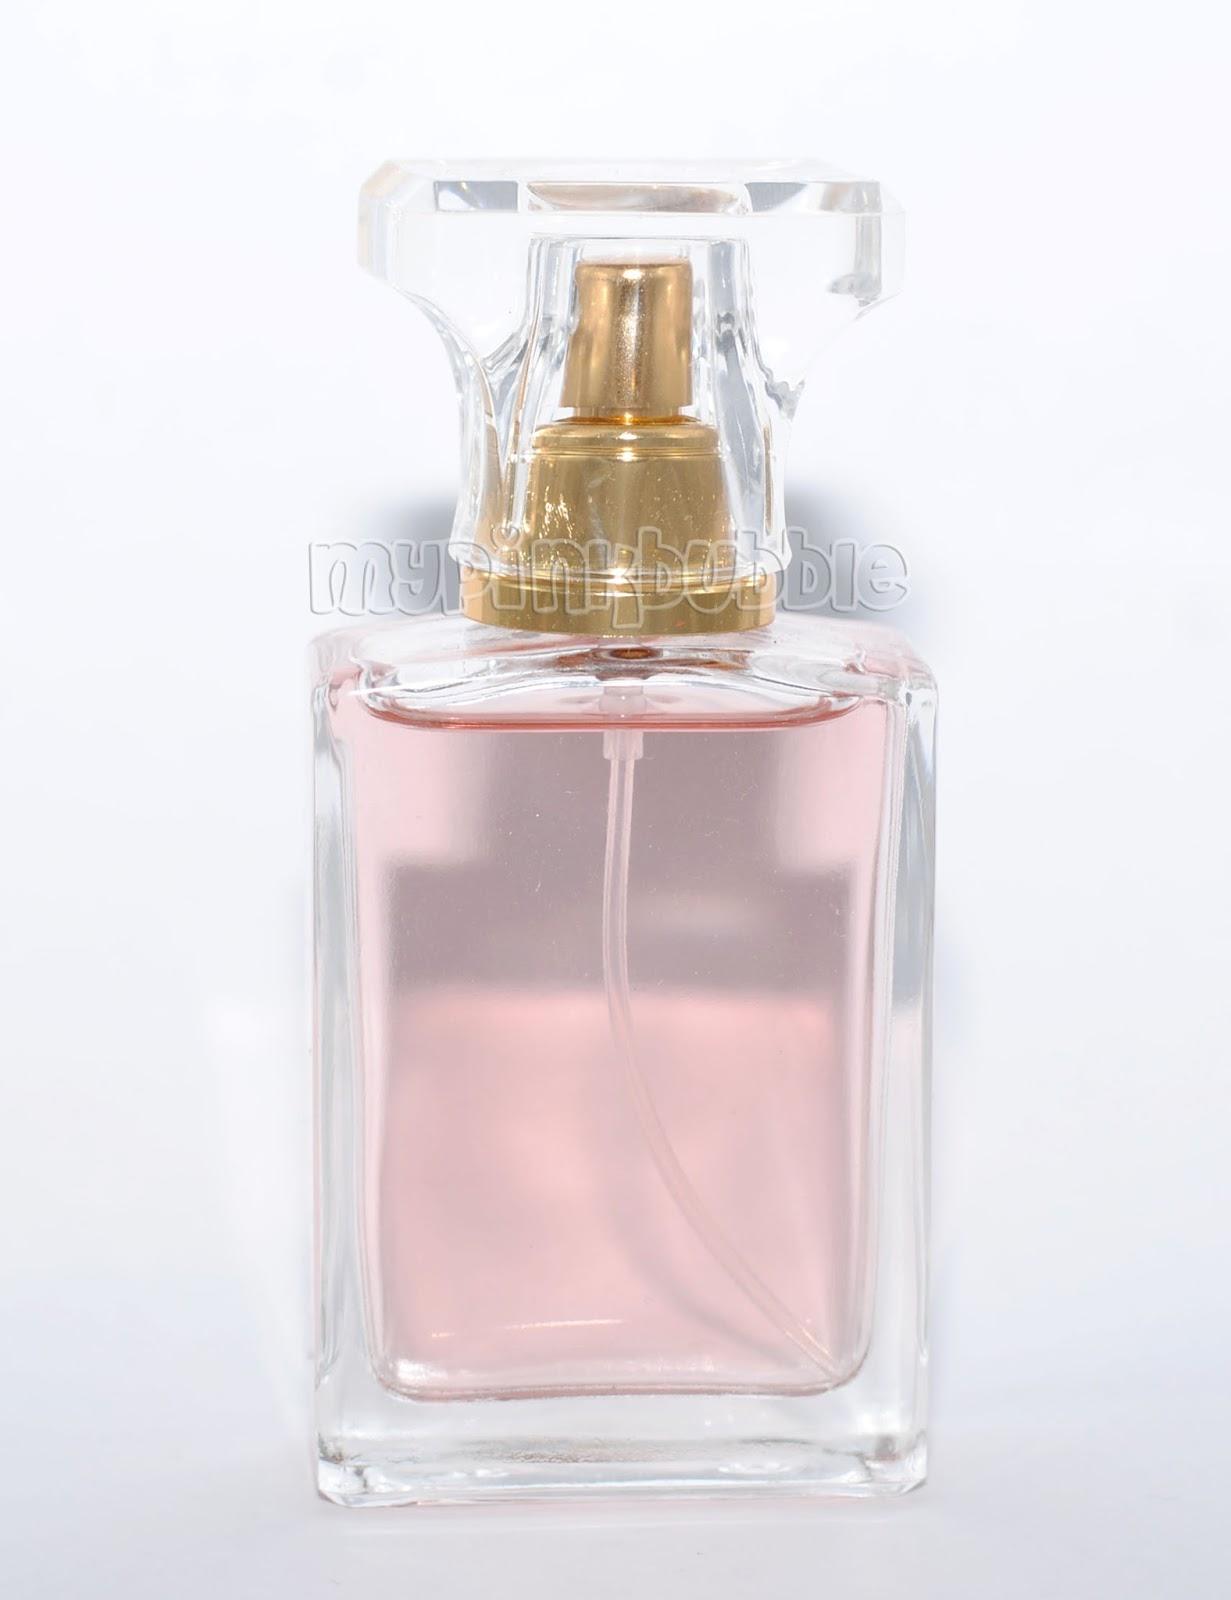 Pressentia perfume